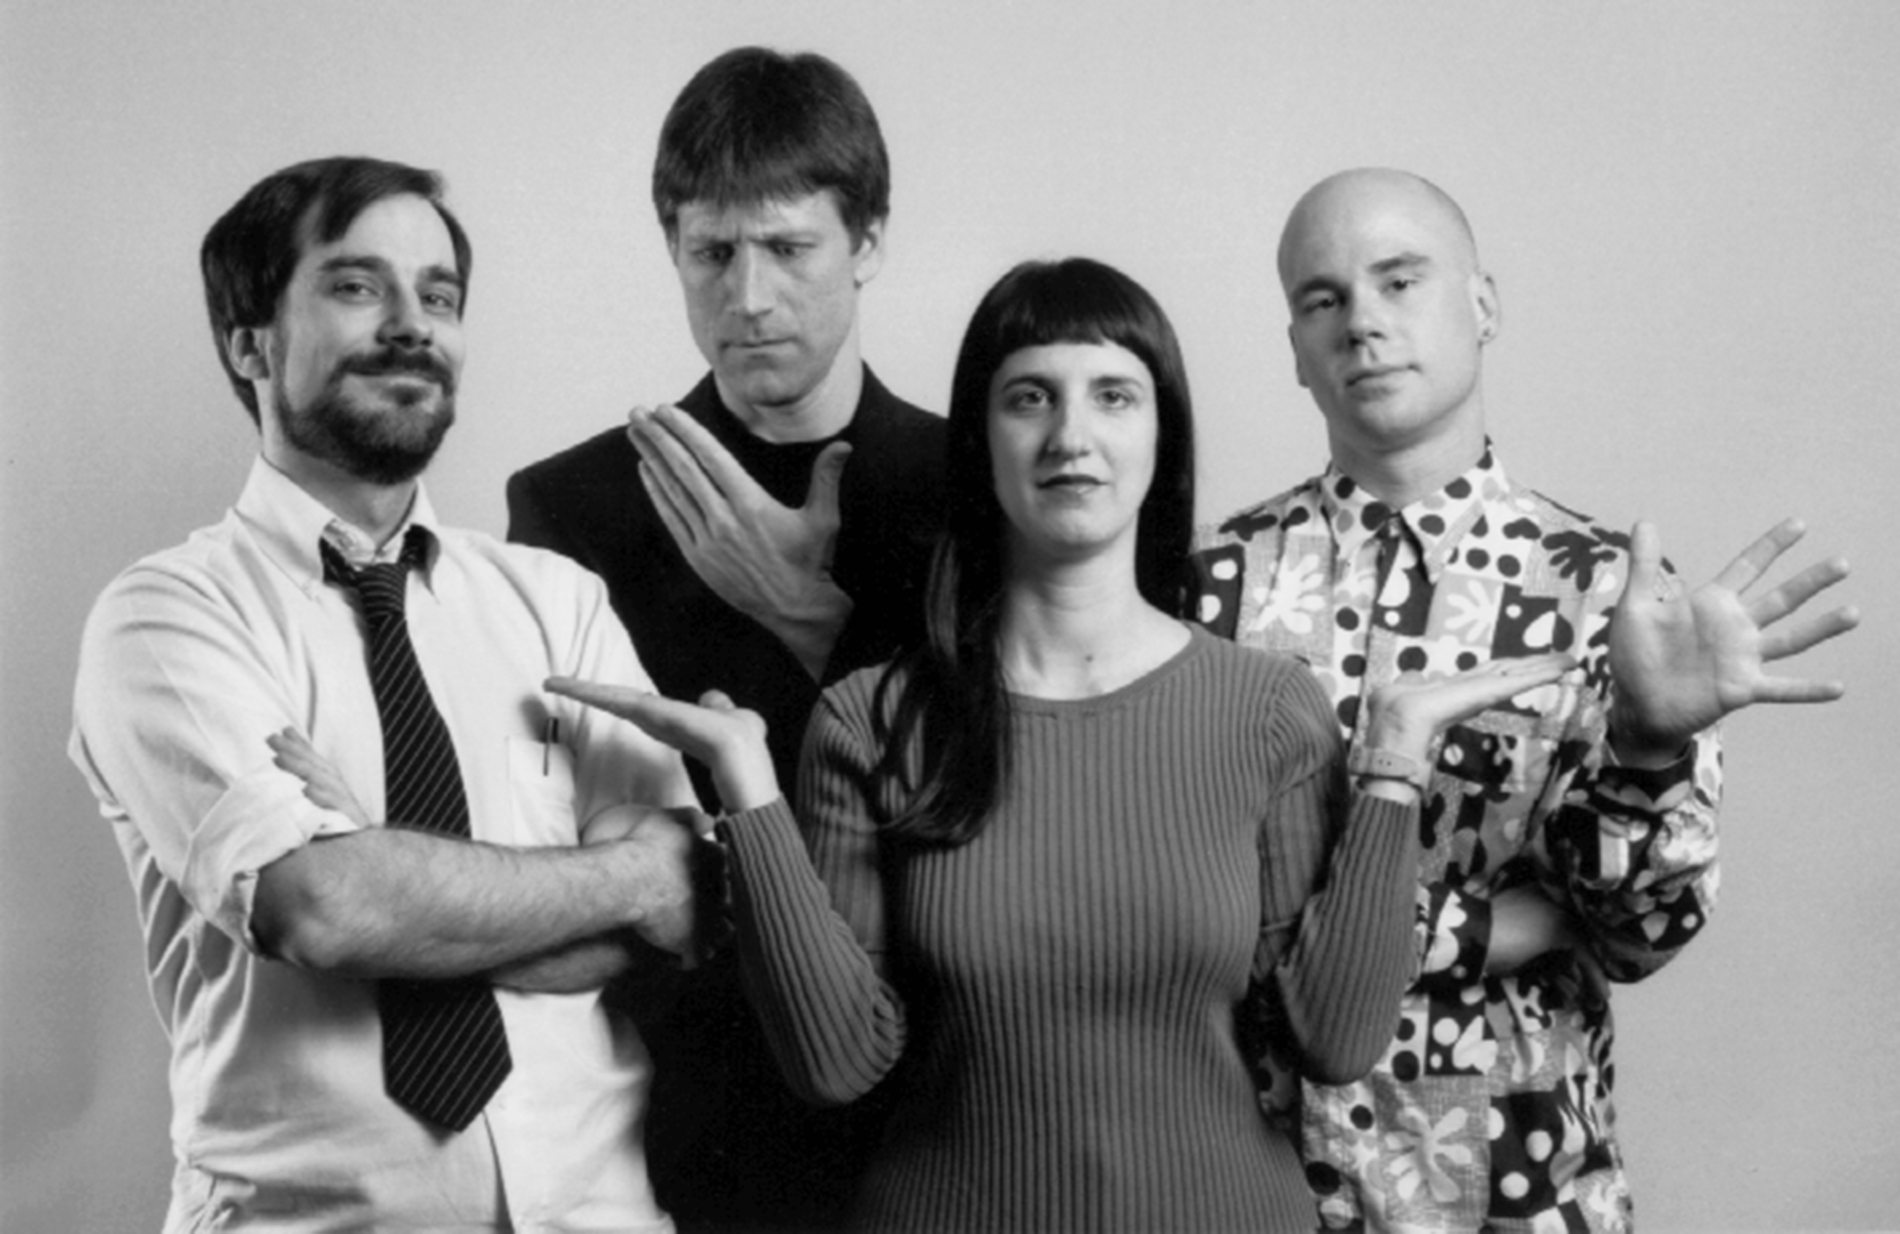 A black & white PR photo of live video performance ensemble 77 Hz taken in 1995. Pictured are members (left-to-right) Michael Schell, Nick Didkovsky, Nancy Meli Walker, and Benton C Bainbridge.